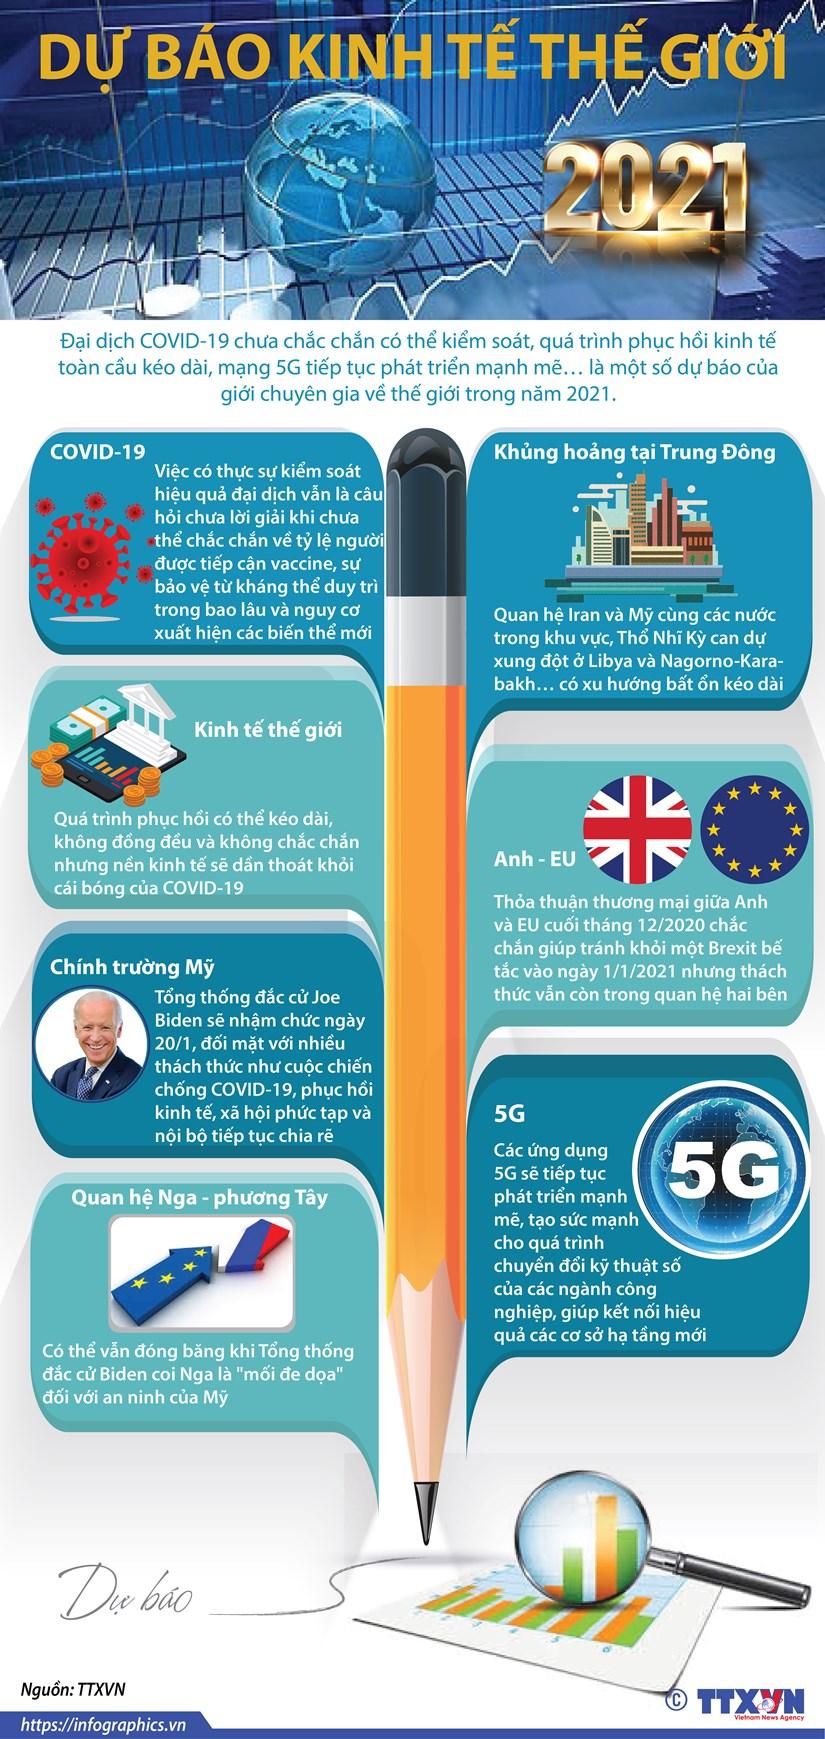 [Infographics] Gioi chuyen gia du bao ve kinh te the gioi trong 2021 hinh anh 1